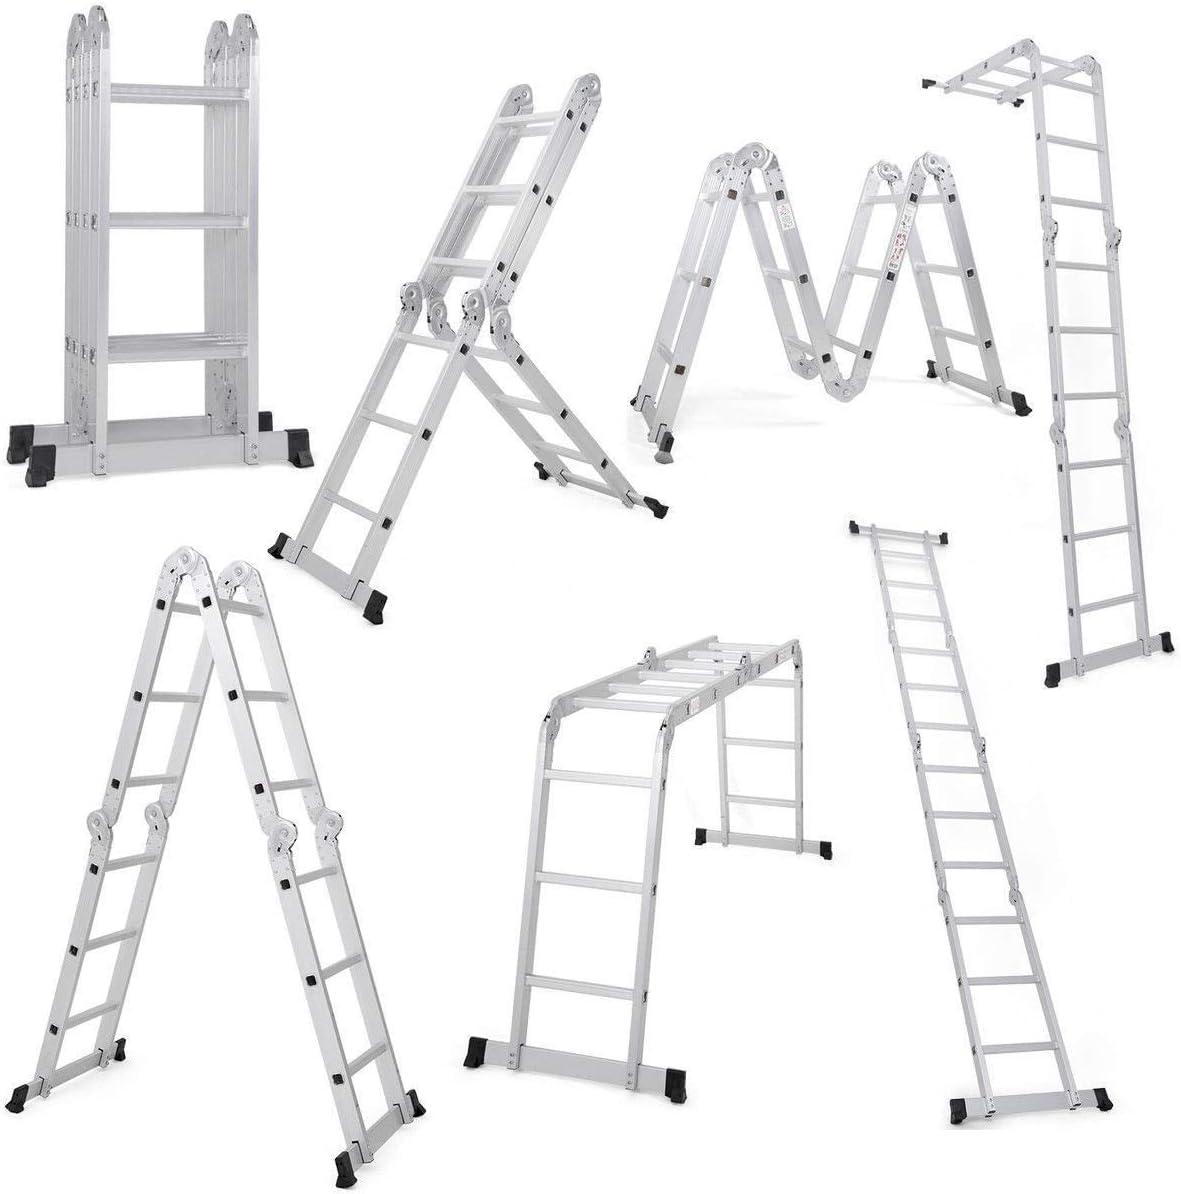 Safeplus Aluminum Lightweight Multi Task Ladder